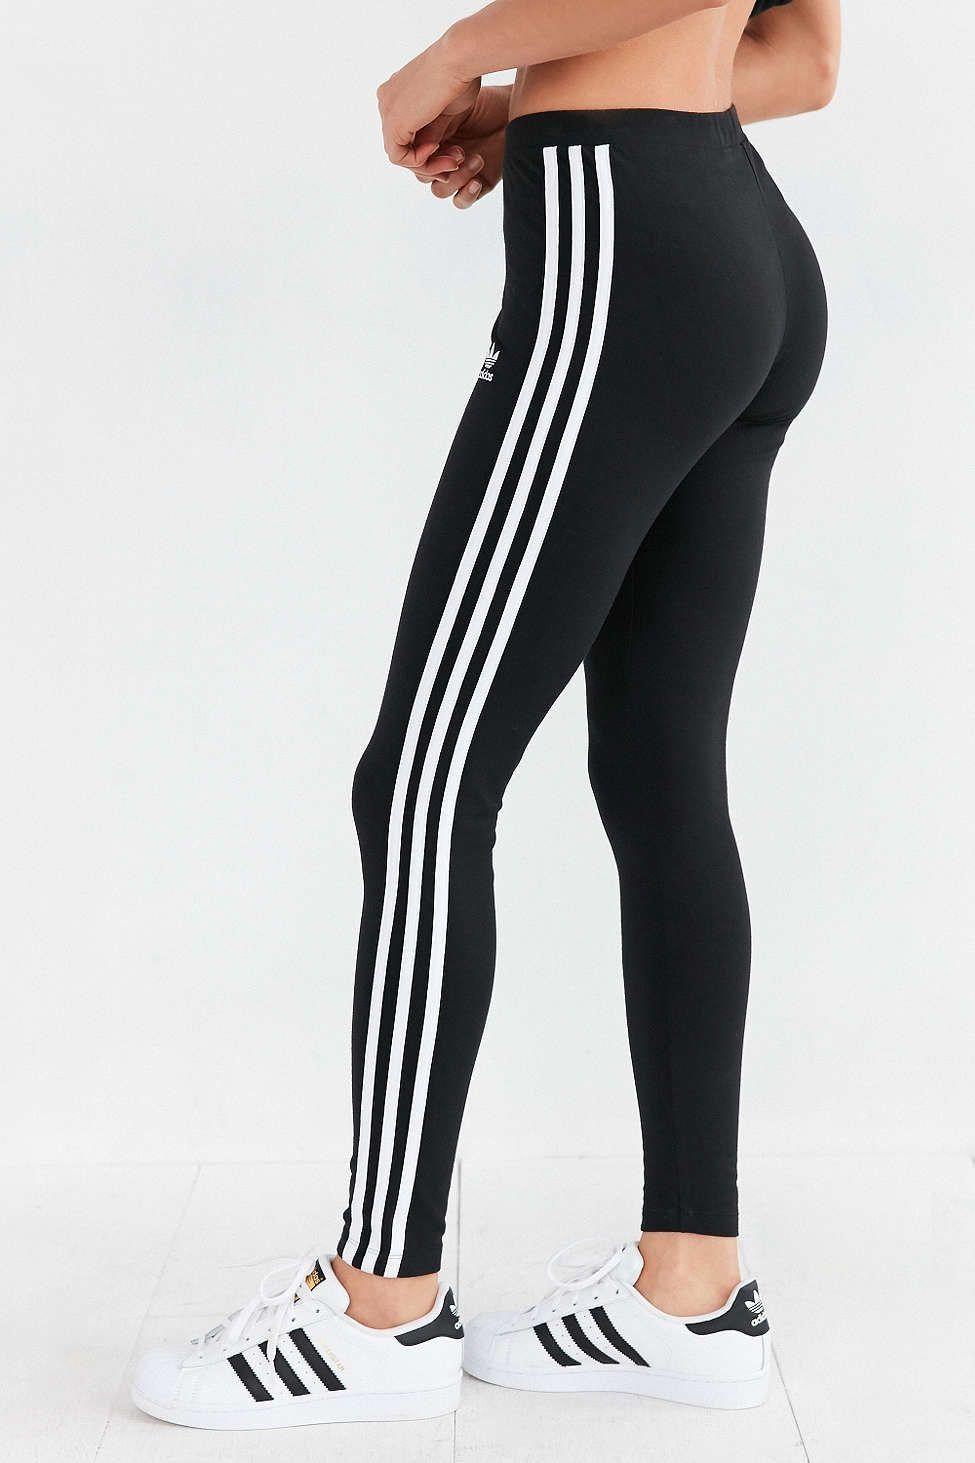 adidas leggings with stripes